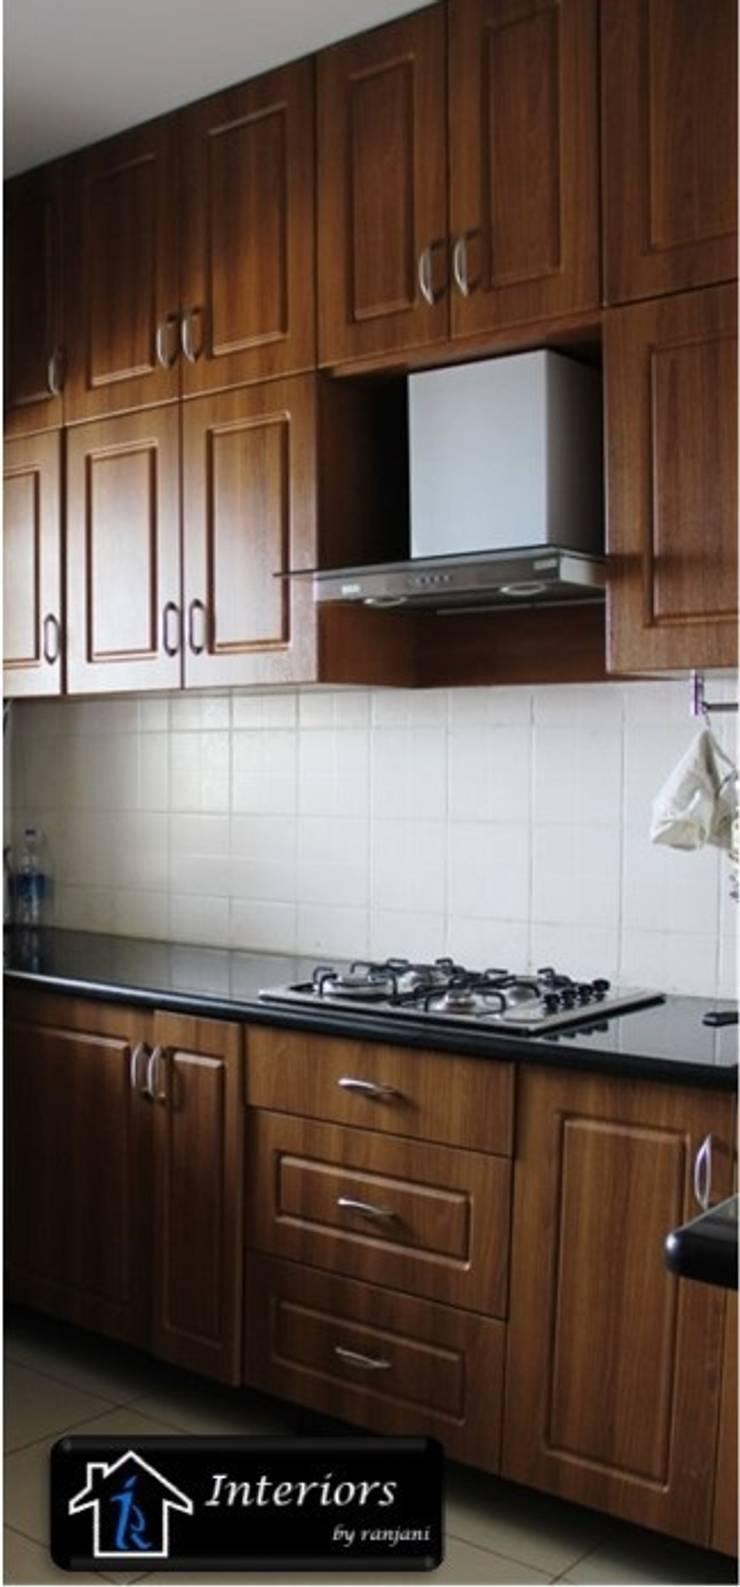 Sandeep Soni -Brigade Metropolise:  Kitchen by Interiors by ranjani